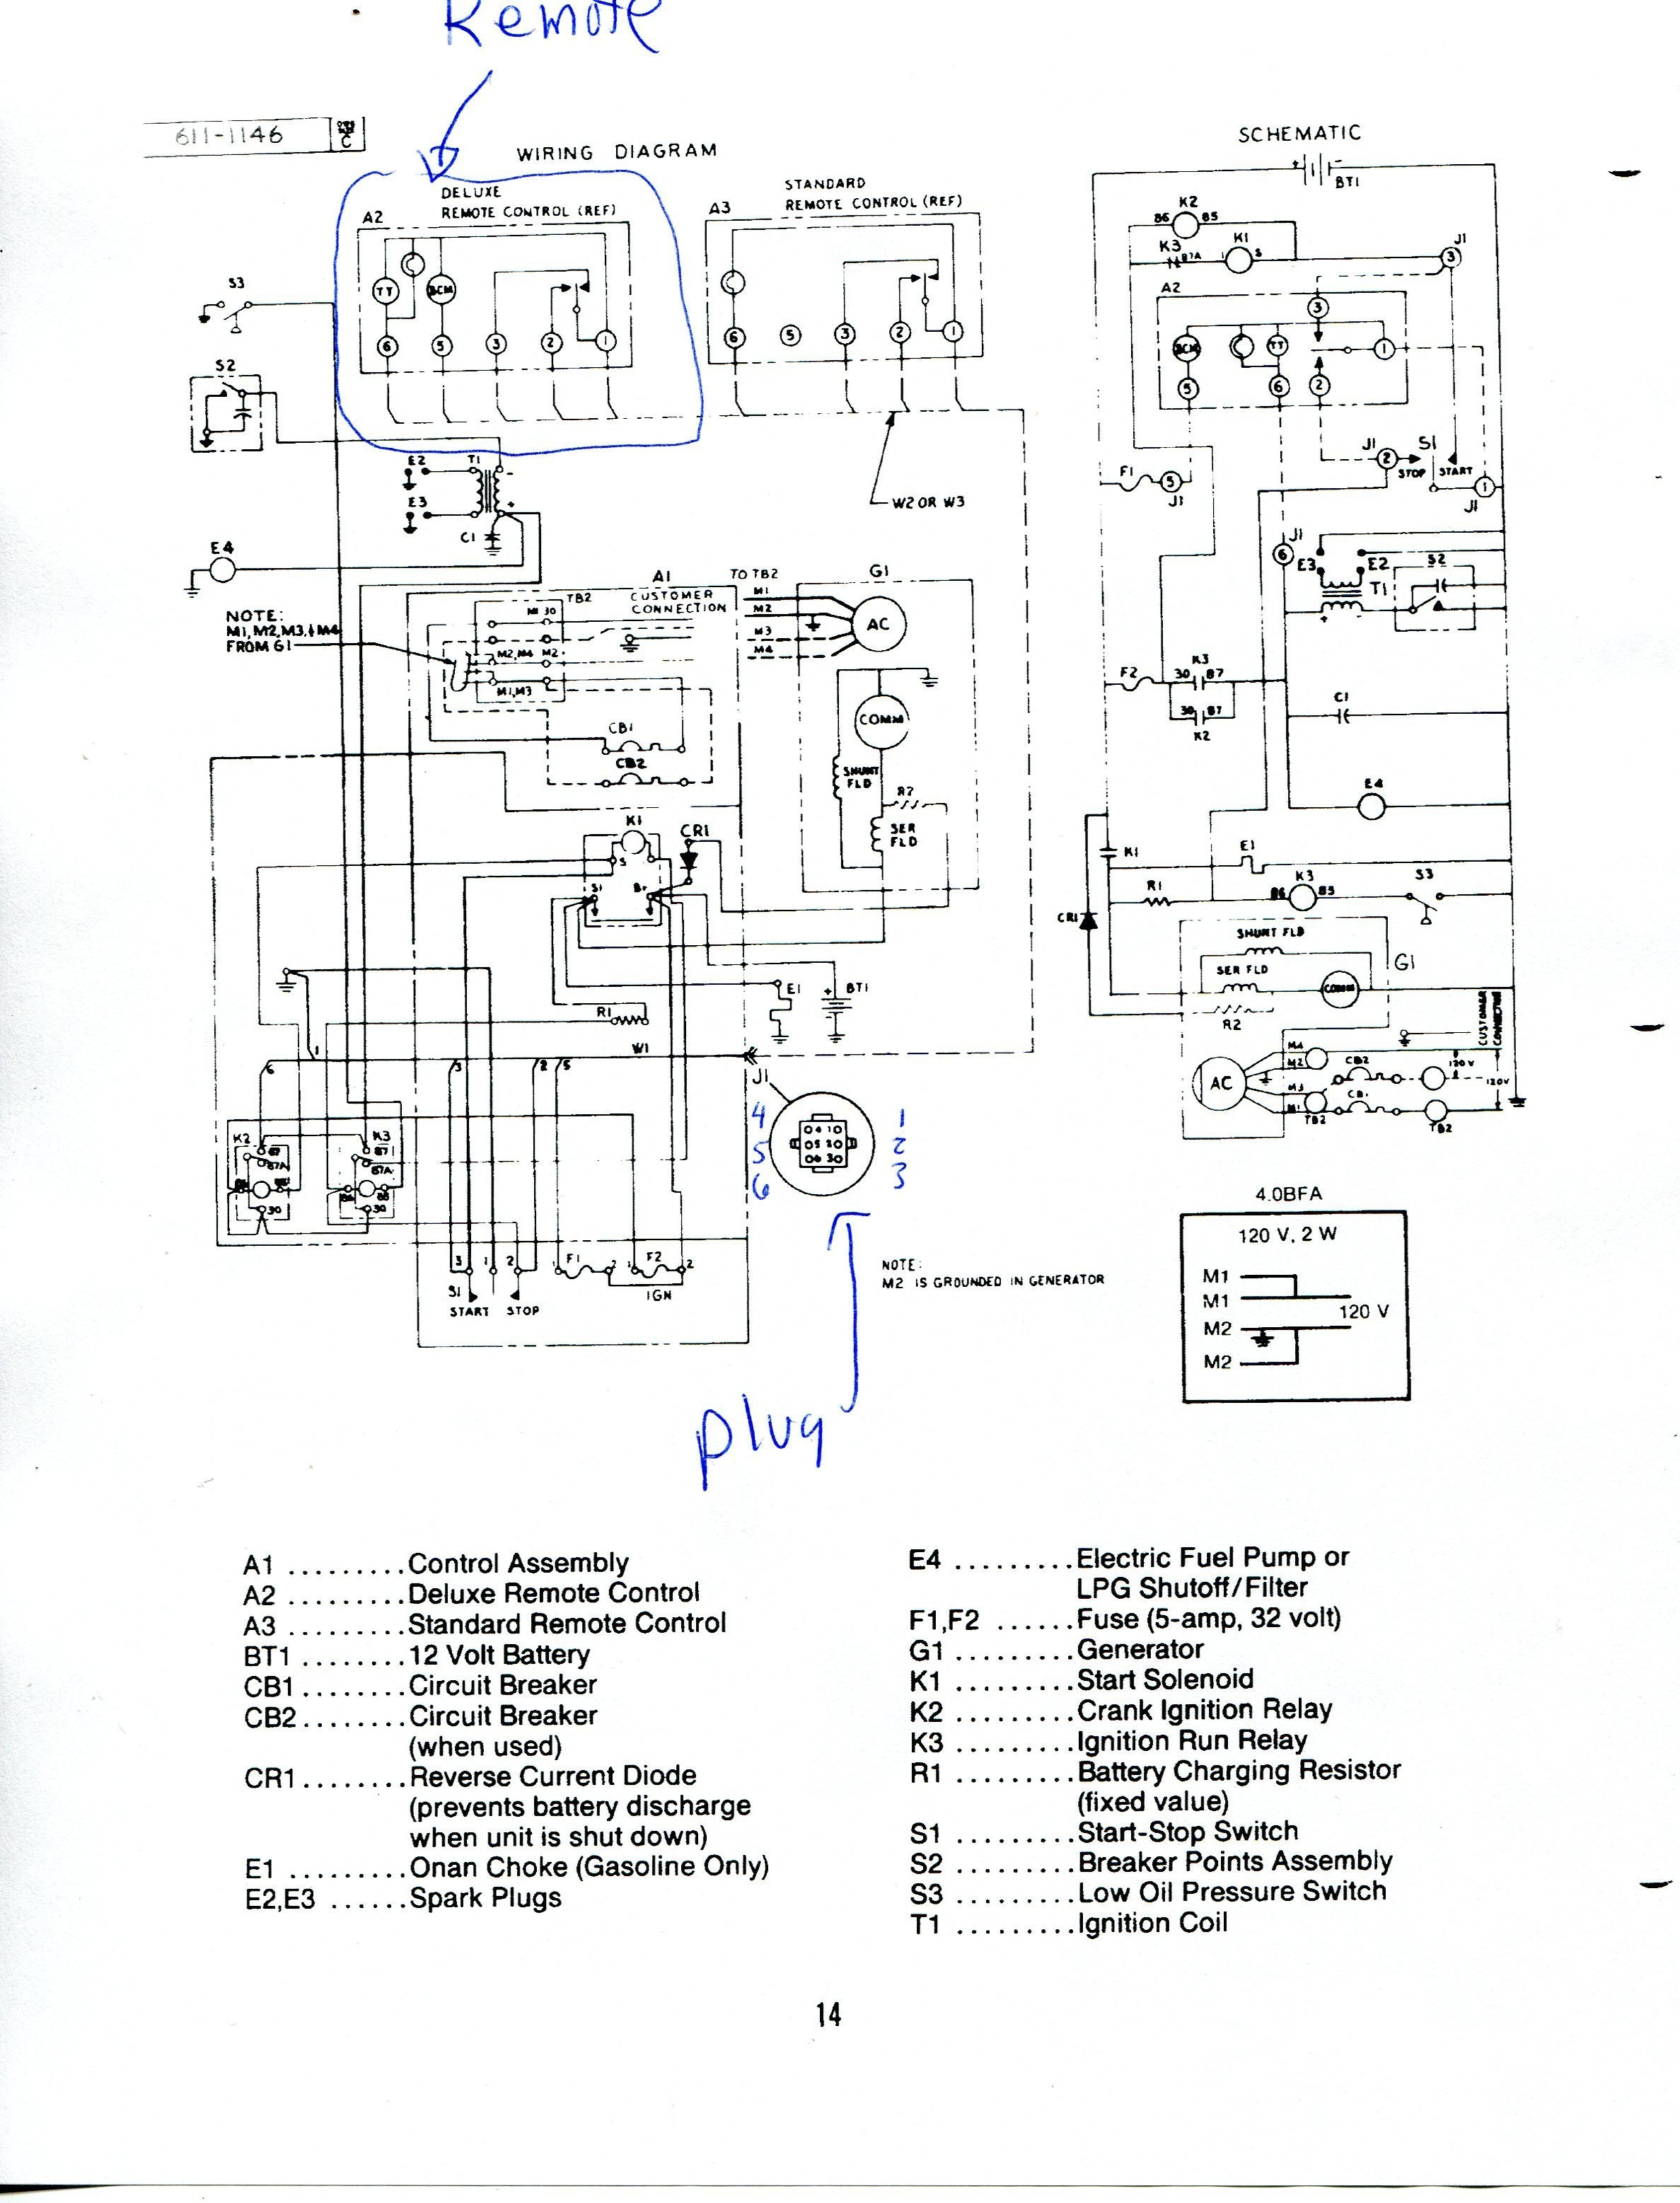 Subaru Remote Starter Subaru Circuit Diagrams